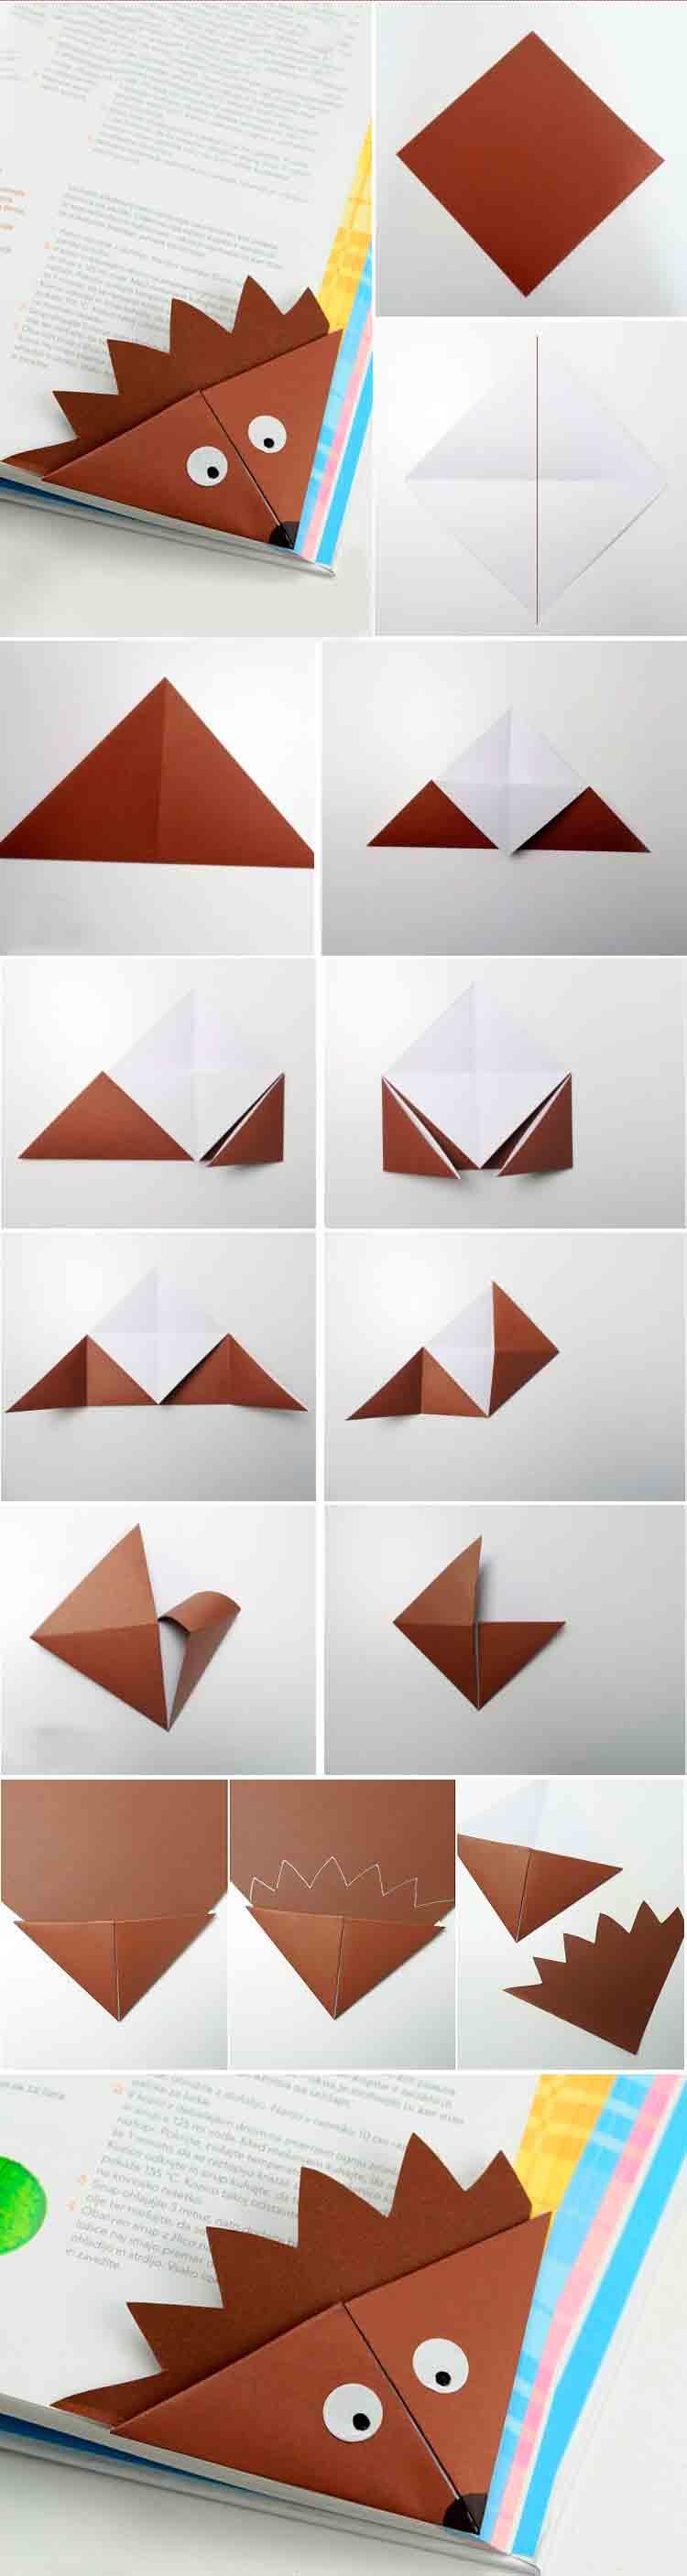 origami-yezhik